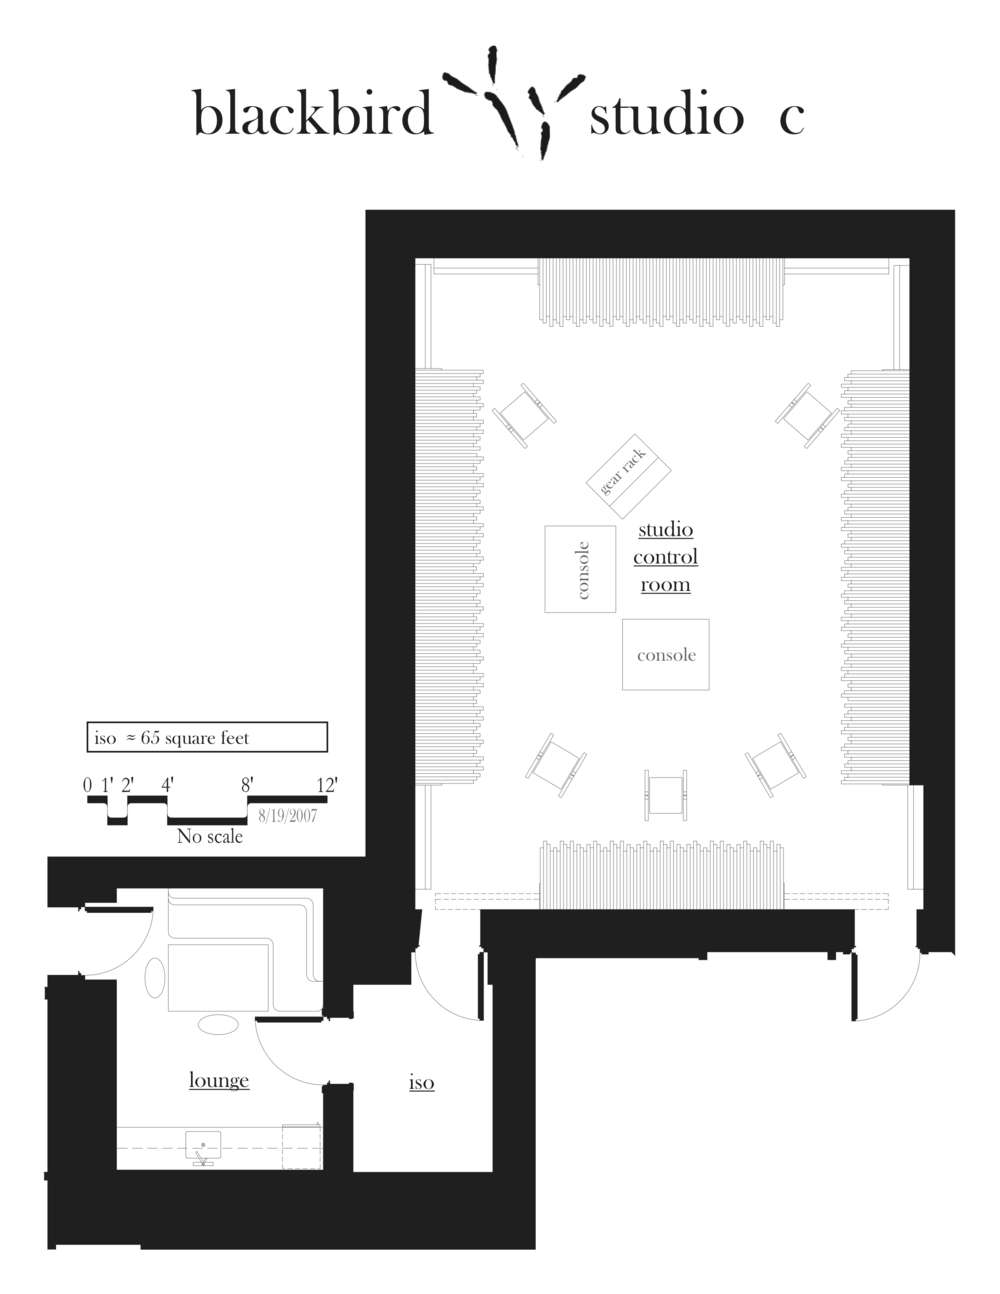 studio_c_layout.png